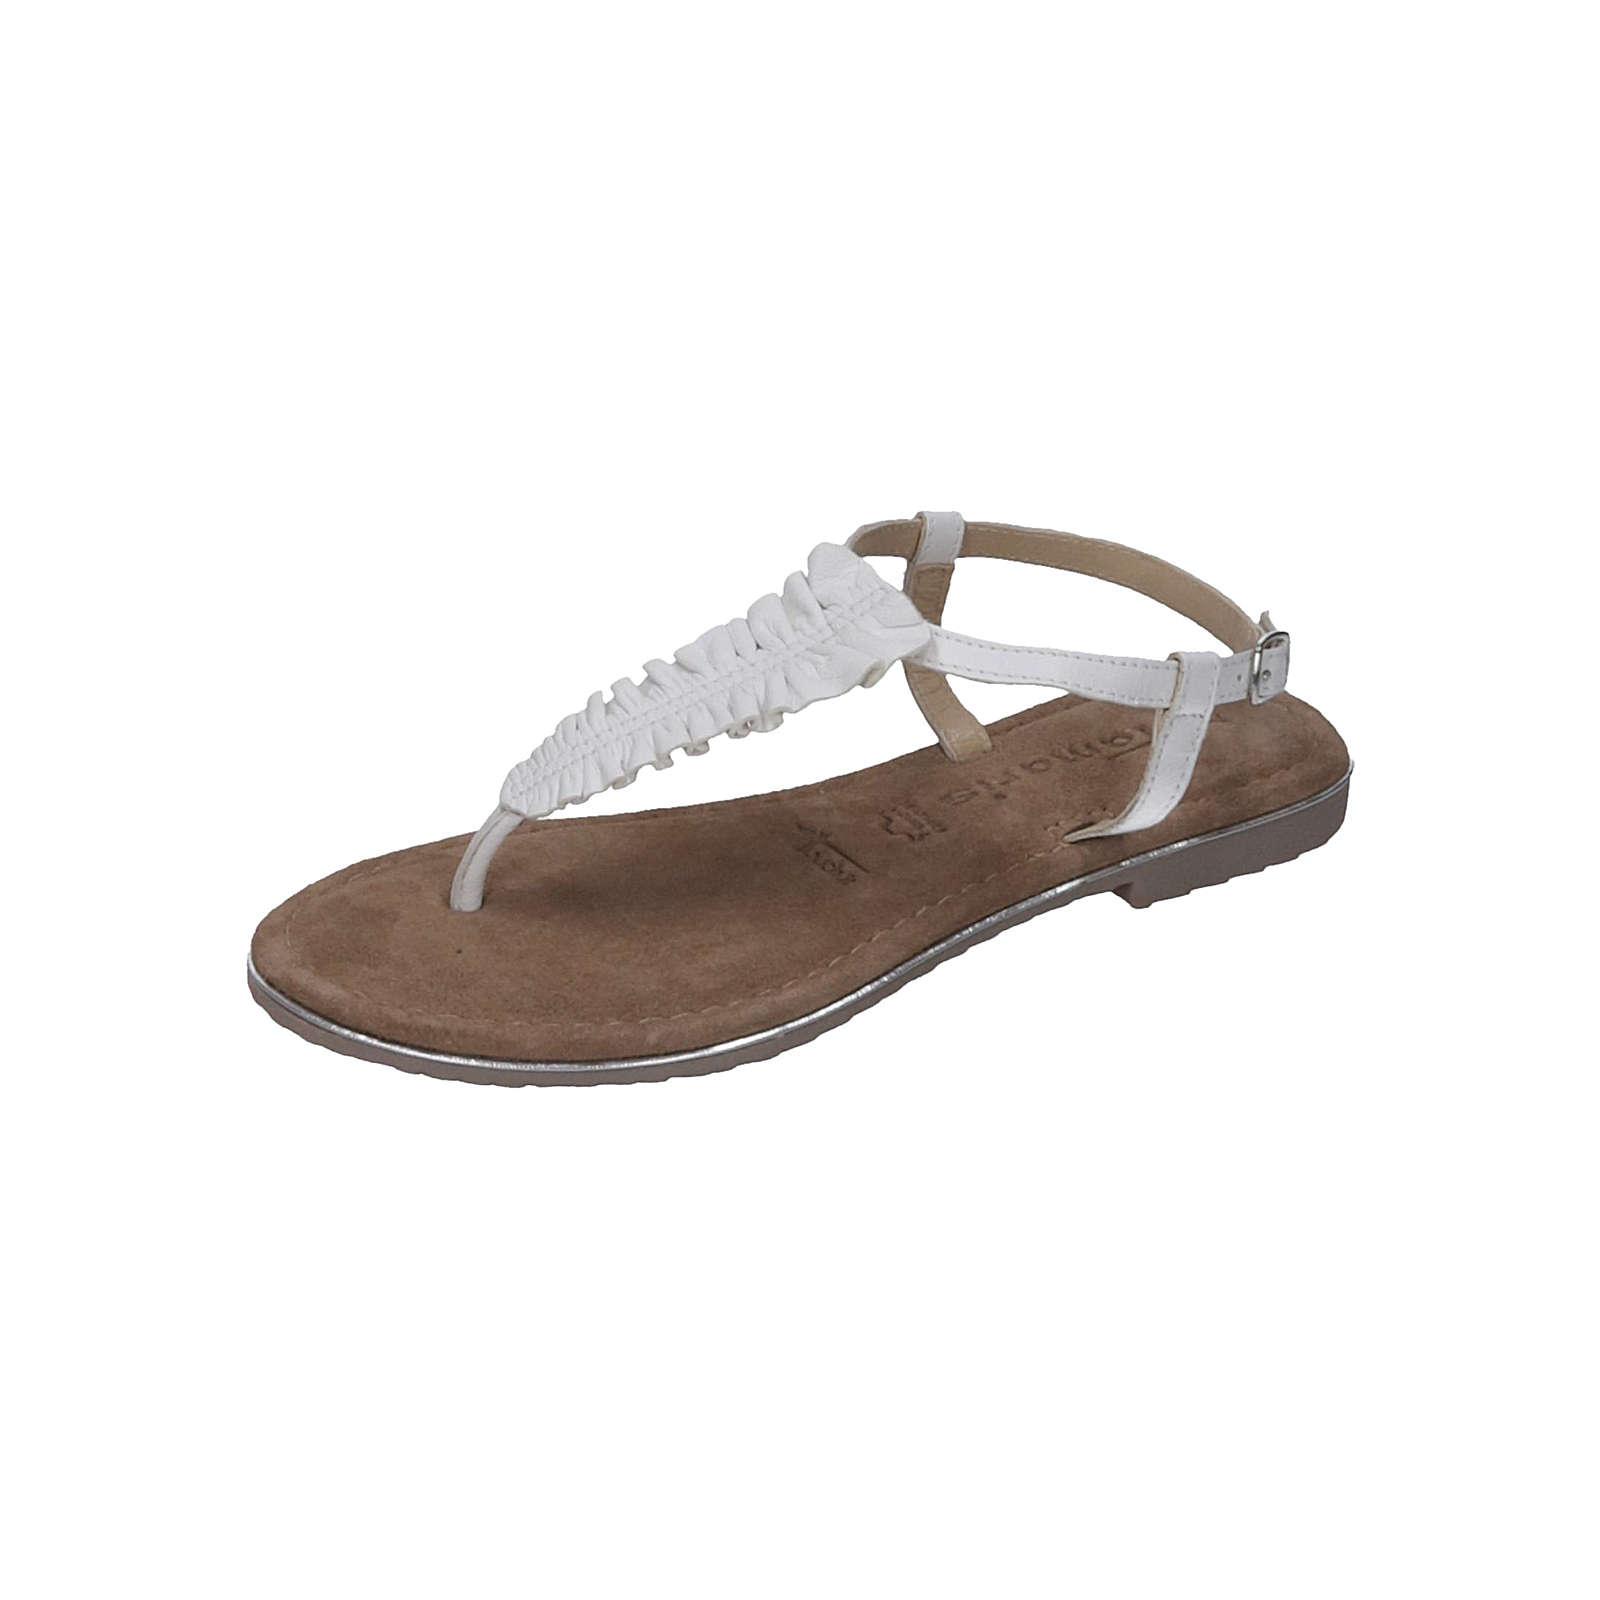 Tamaris Damen Sandalette T-Steg-Sandalen weiß Damen Gr. 38